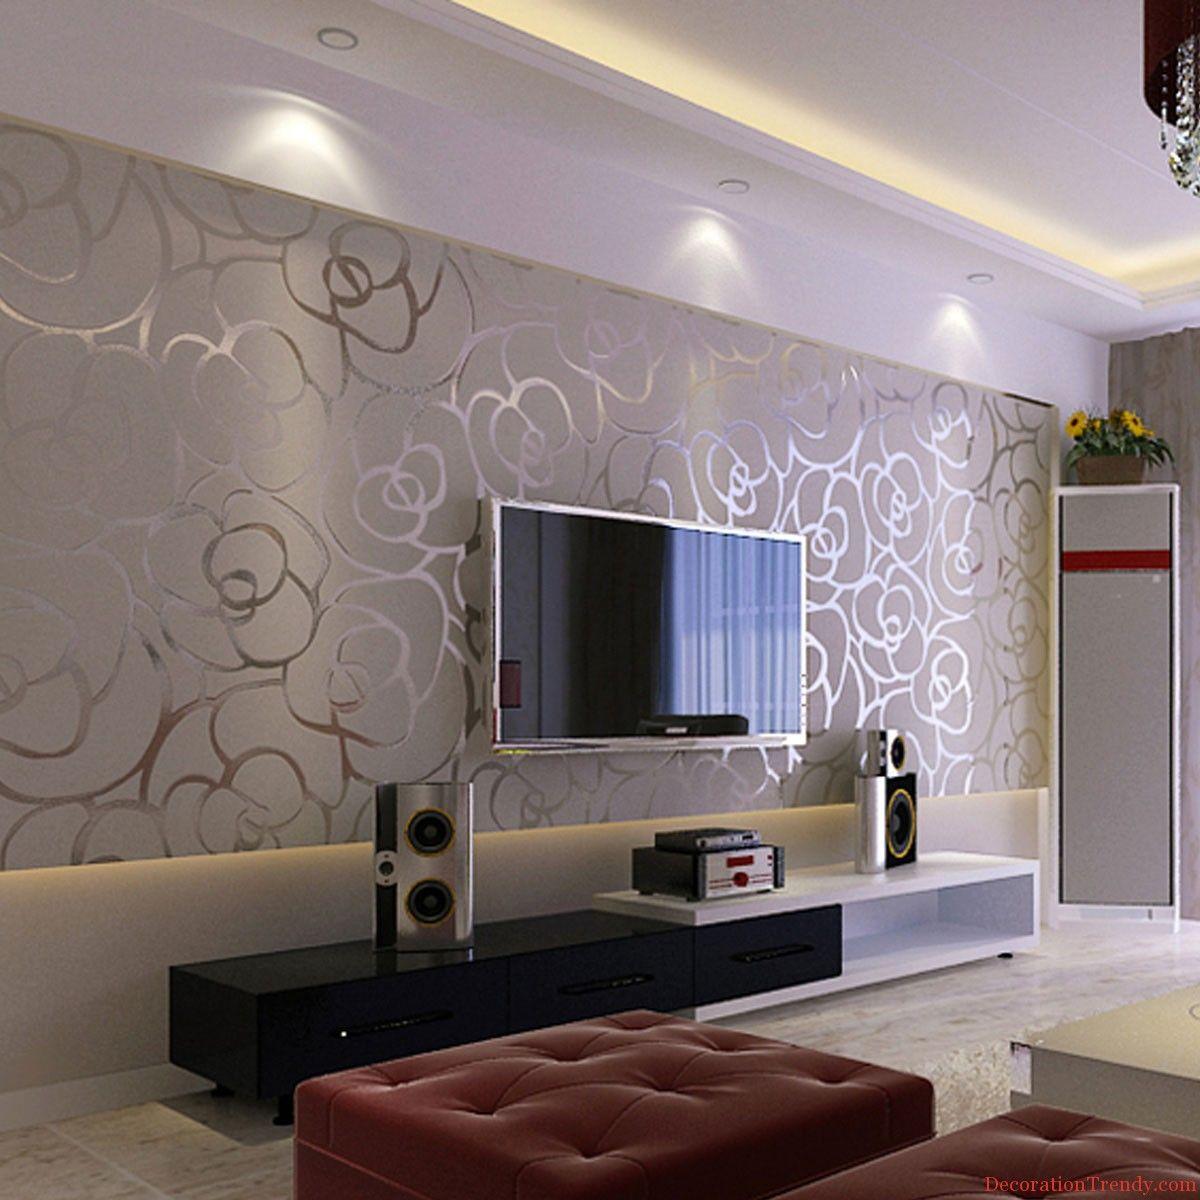 Home Wallpaper Design Decoration Idea 15 Wallpaper Designs 4 Concepts For Your Own Modern Wallpaper Living Room Modern Wallpaper Designs Wallpaper Living Room